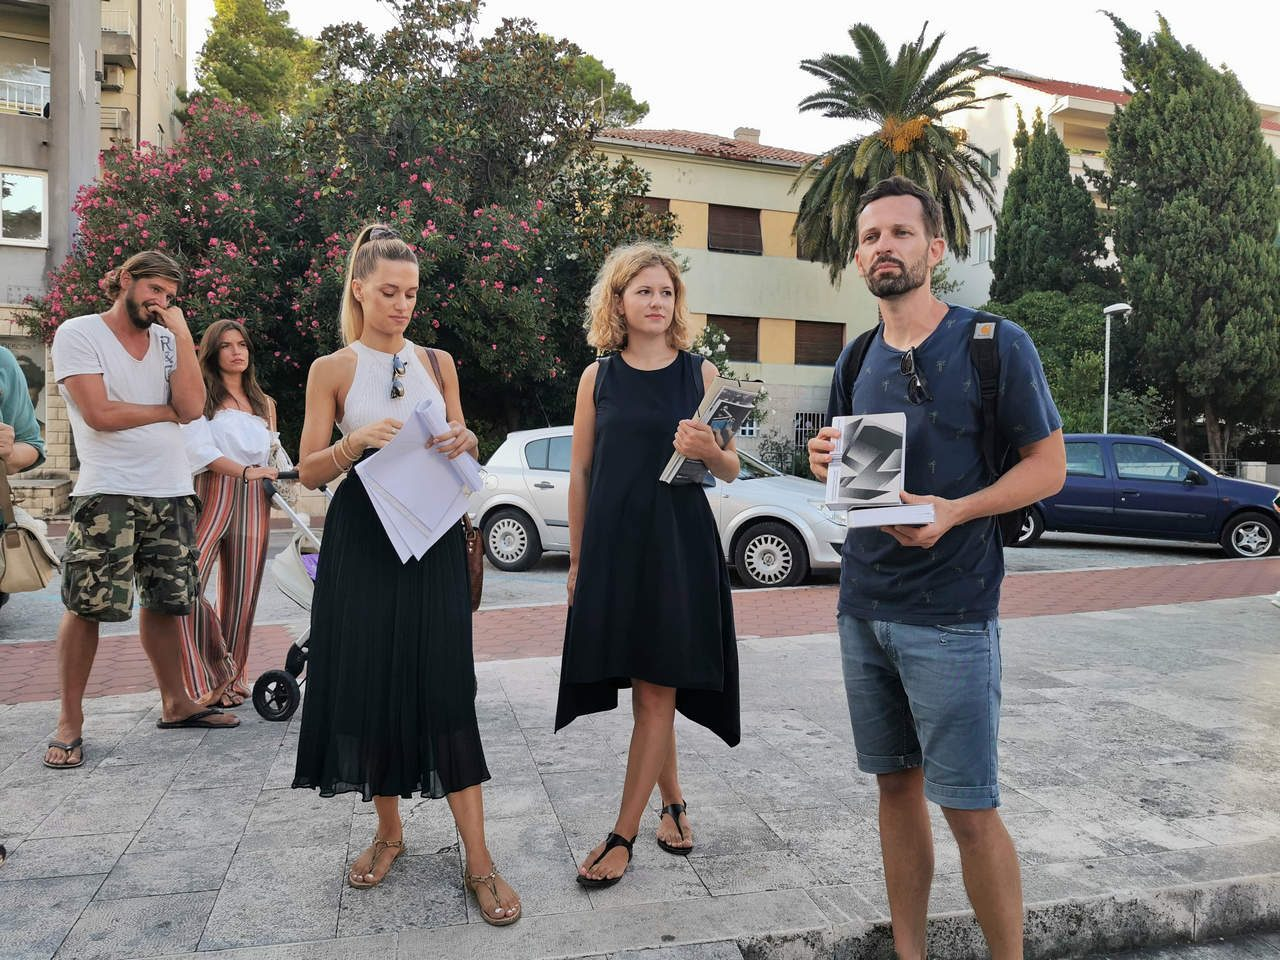 moderna_makarska-udruga_kacic-2019-07